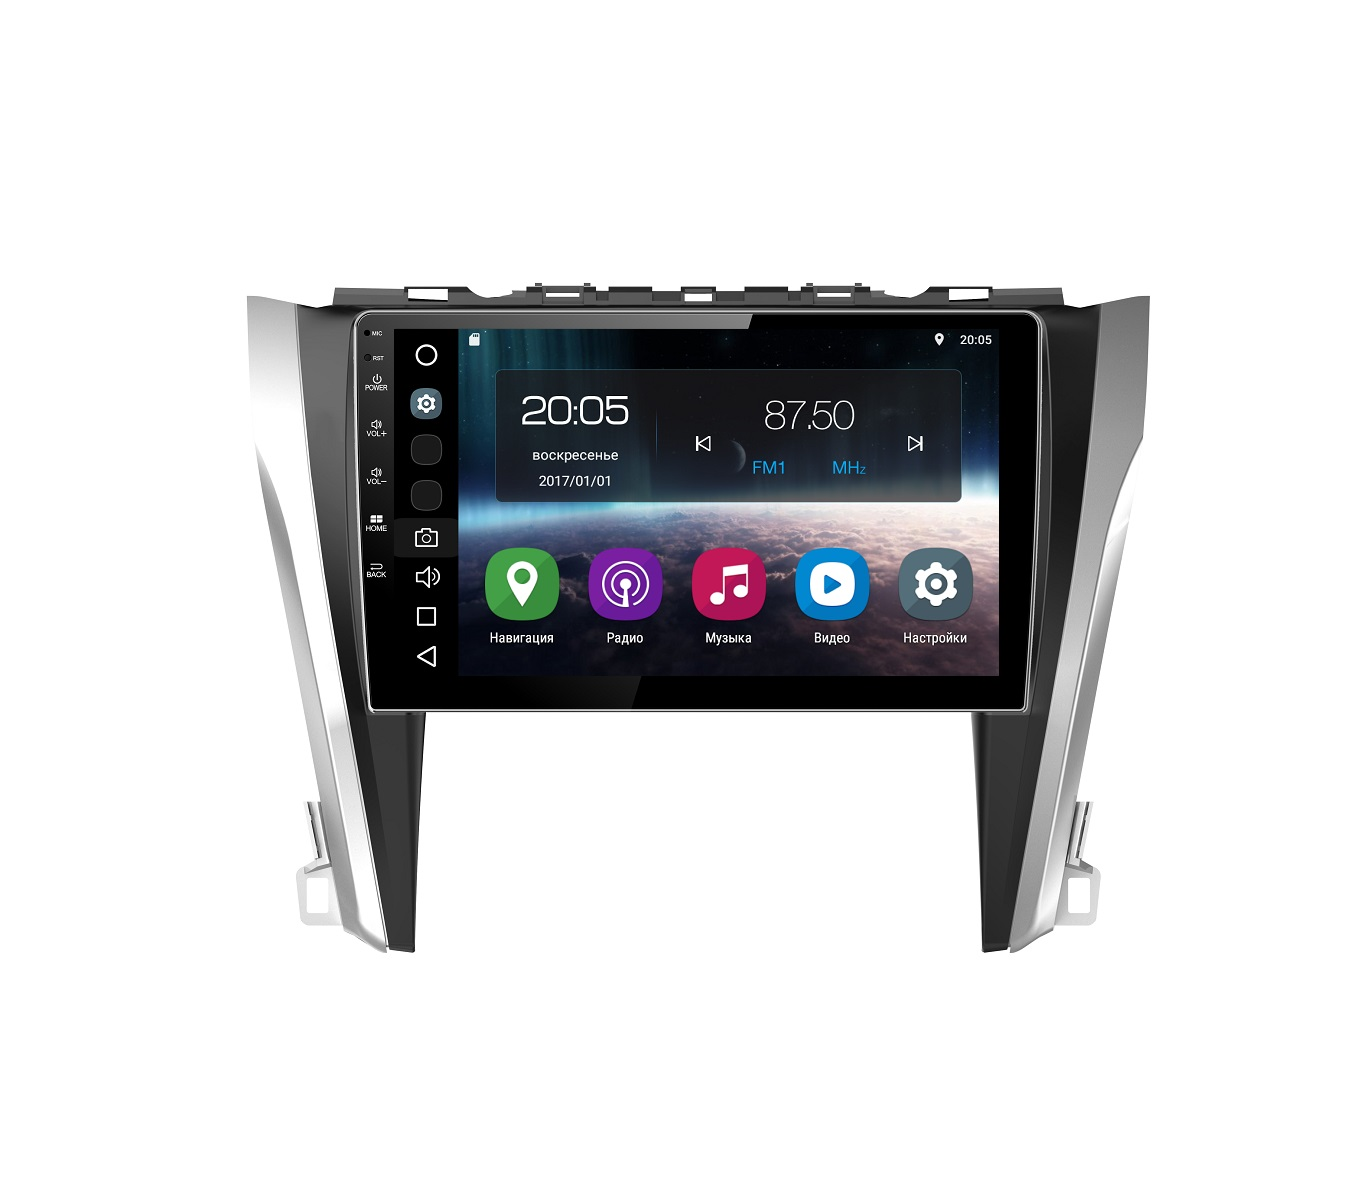 Штатная магнитола FarCar s200 для Toyota Camry 2014+ на Android (V466R)